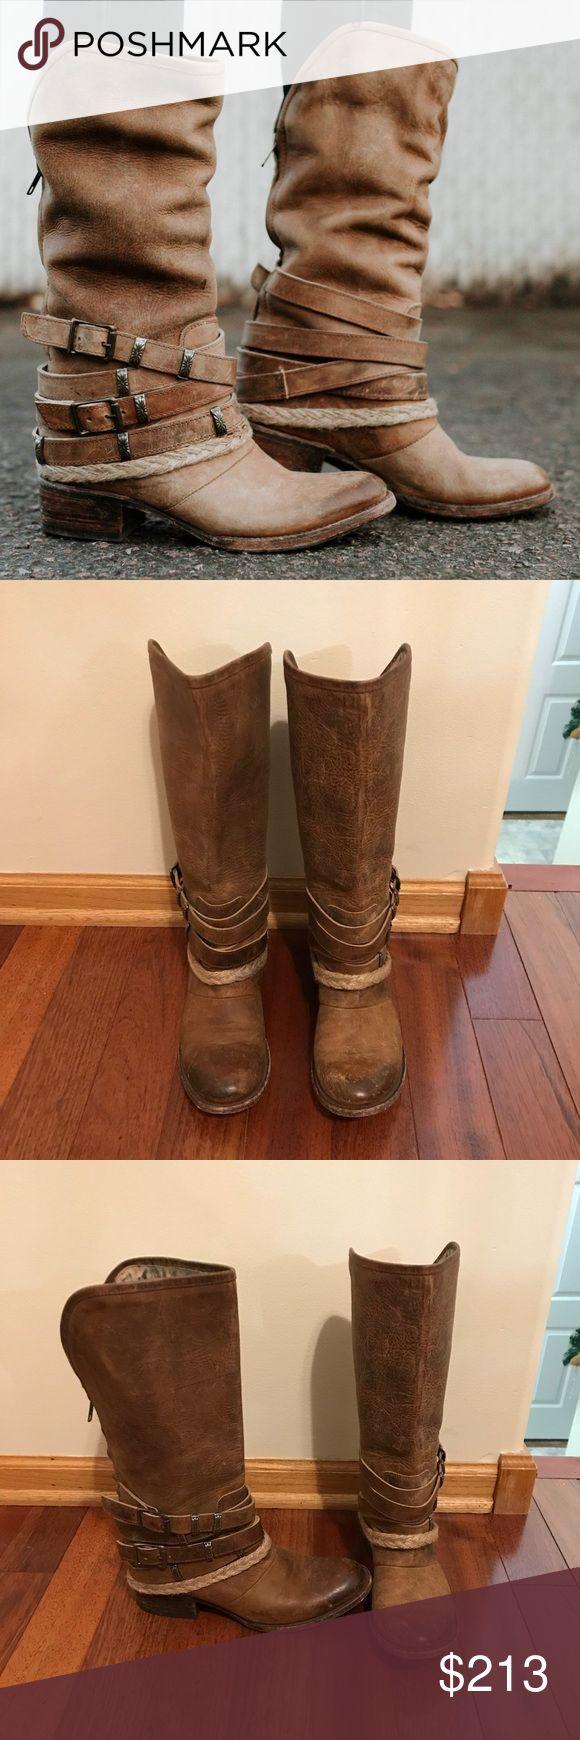 I just added this listing on Poshmark: Freebird Drove Boot Size 8. #shopmycloset #poshmark #fashion #shopping #style #forsale #Freebird by Steven #Shoes